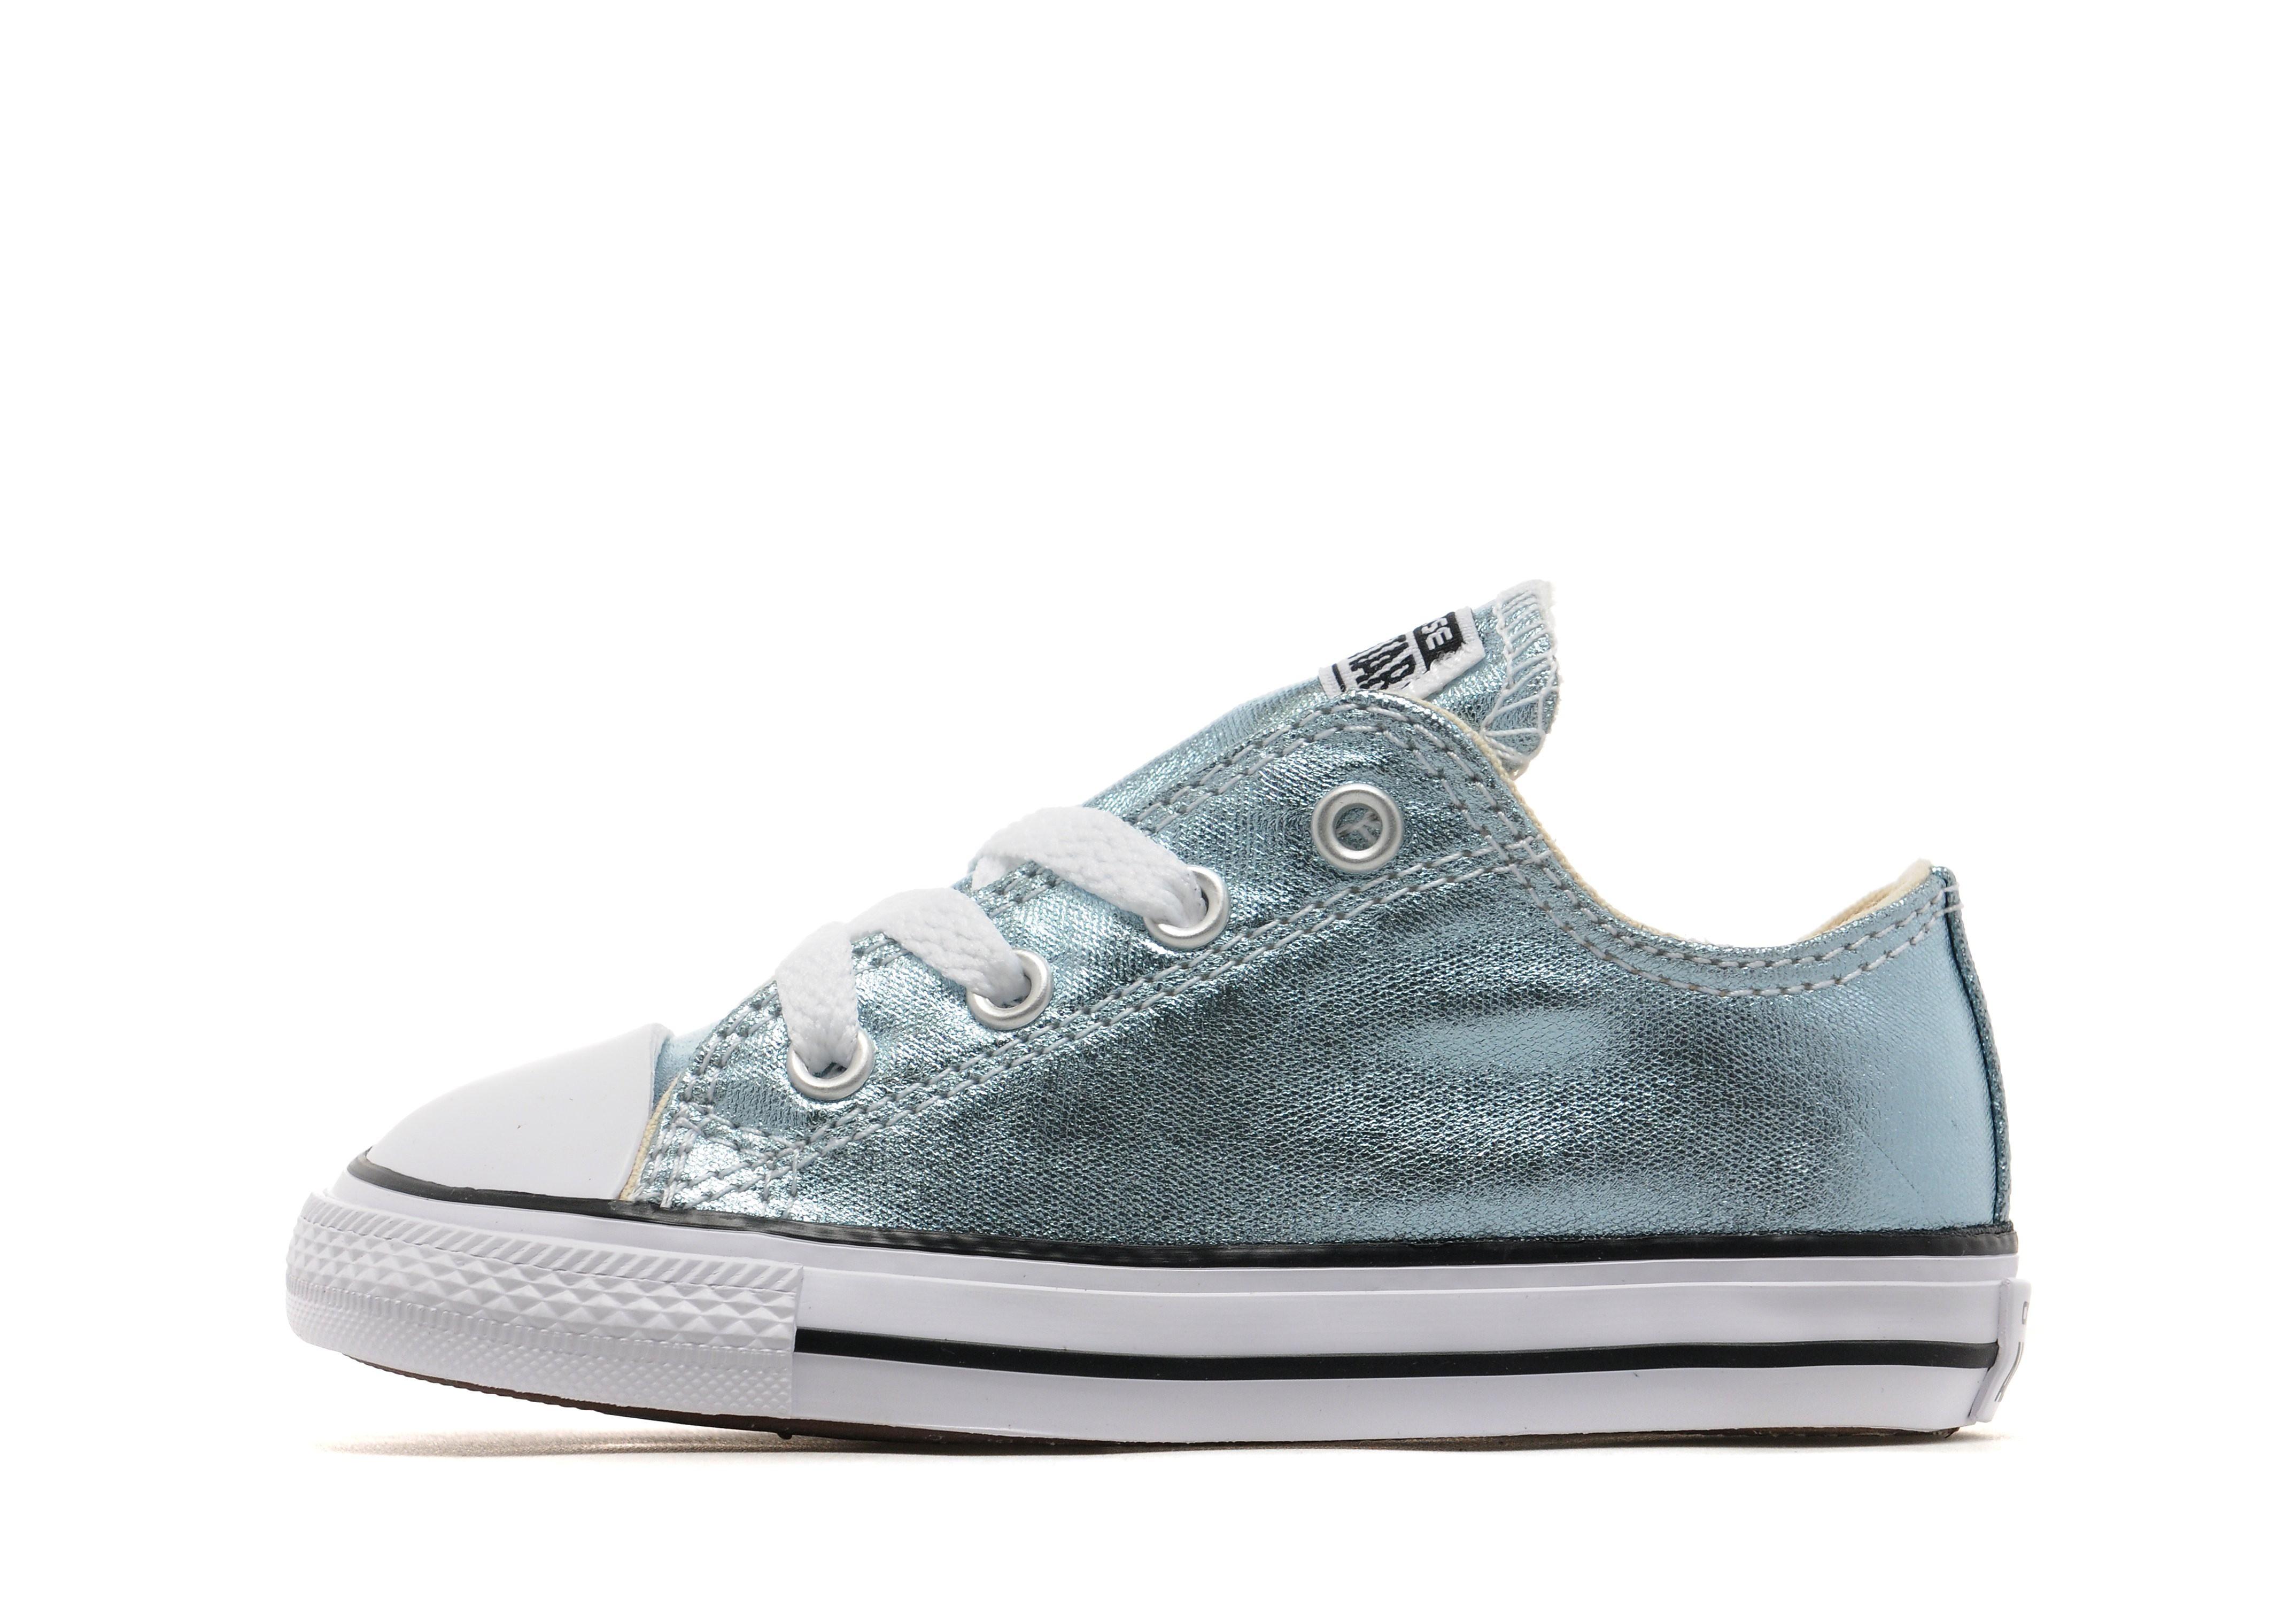 71cfdec9505b Converse All Star Metallic Ox Infant - Glacier - Kids